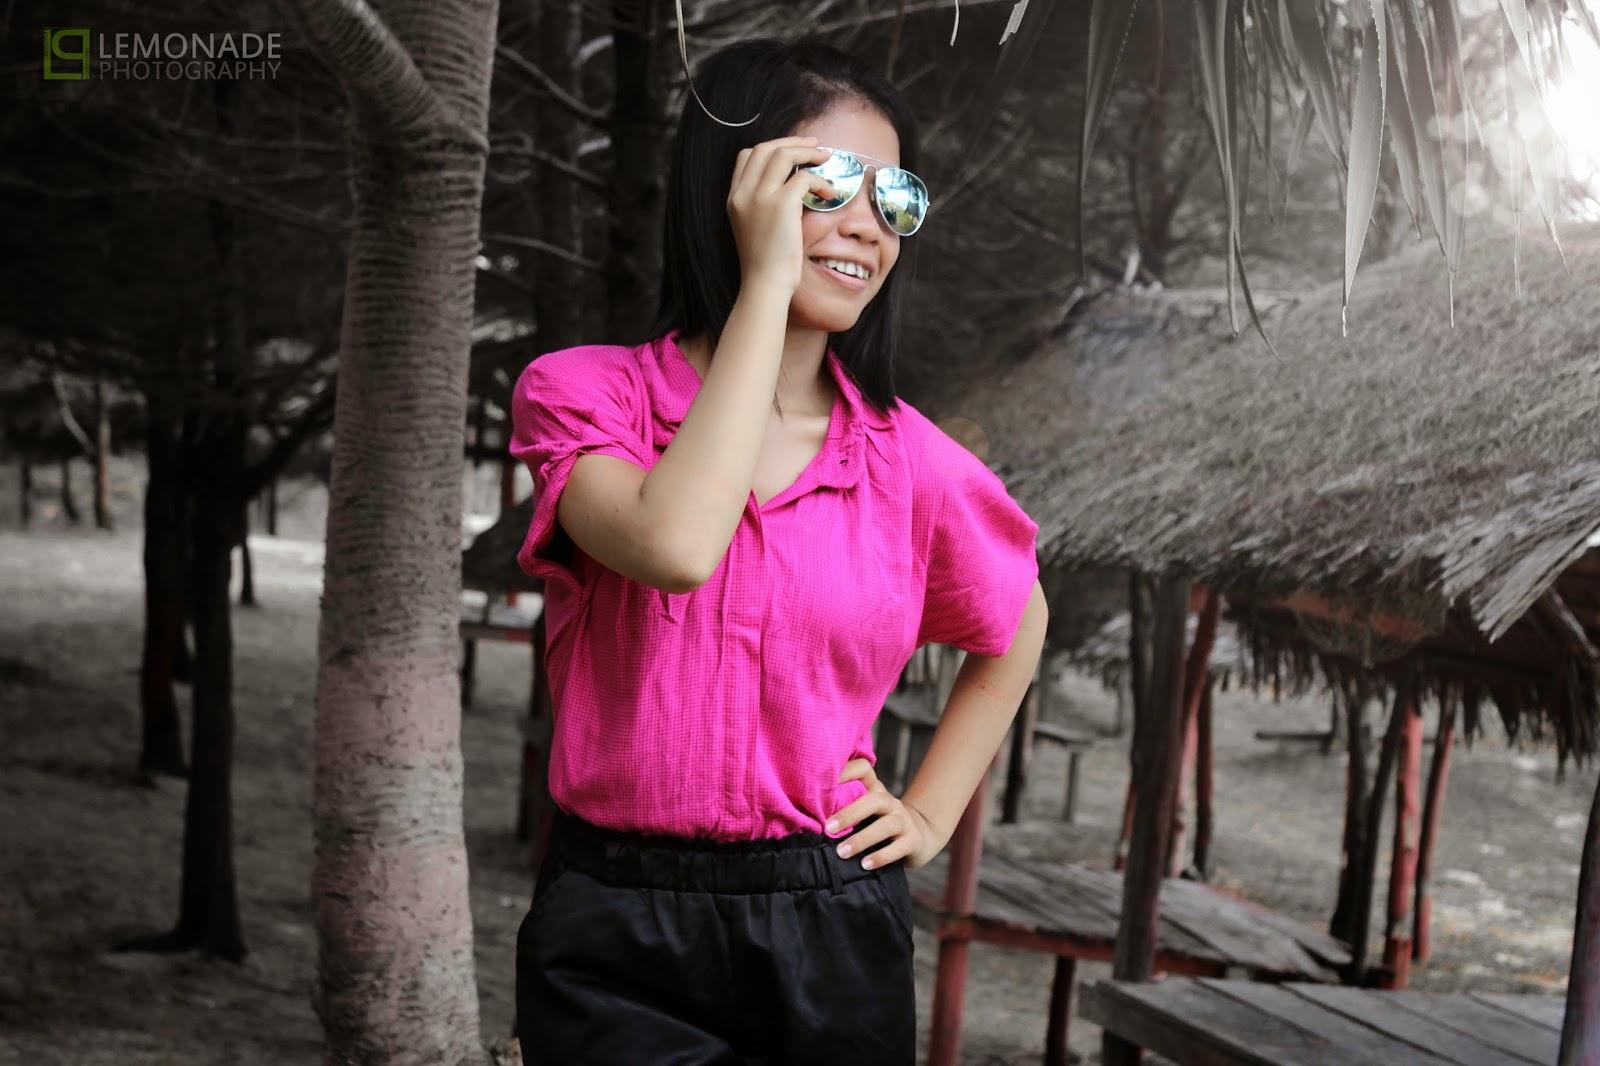 http://lemonade-photography.blogspot.com/2014/03/membuat-foto-keren-dengan-selective.html